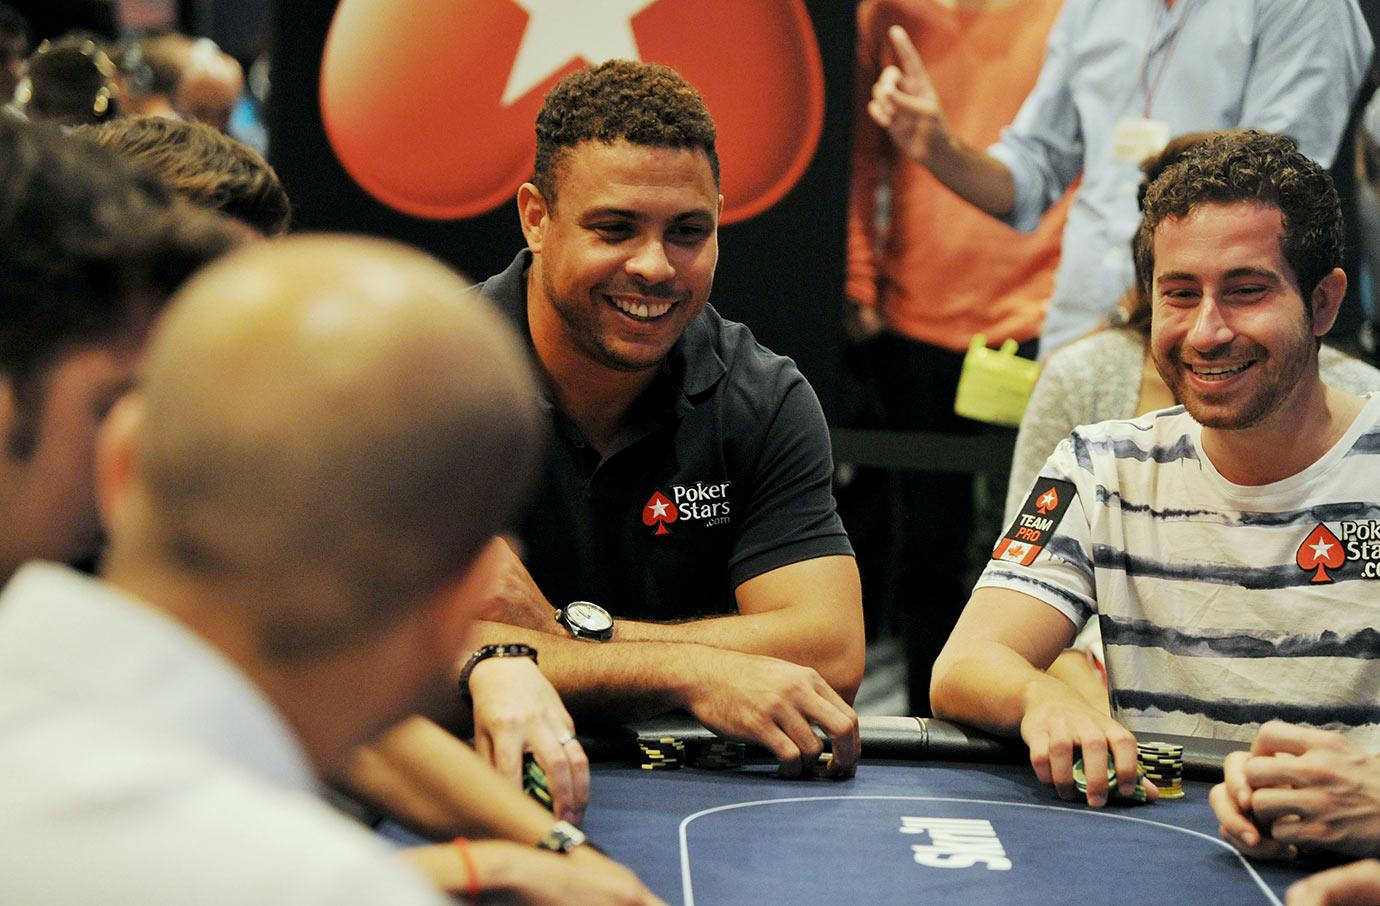 Ronaldo attends the 2013 European Poker Tour in Barcelona.